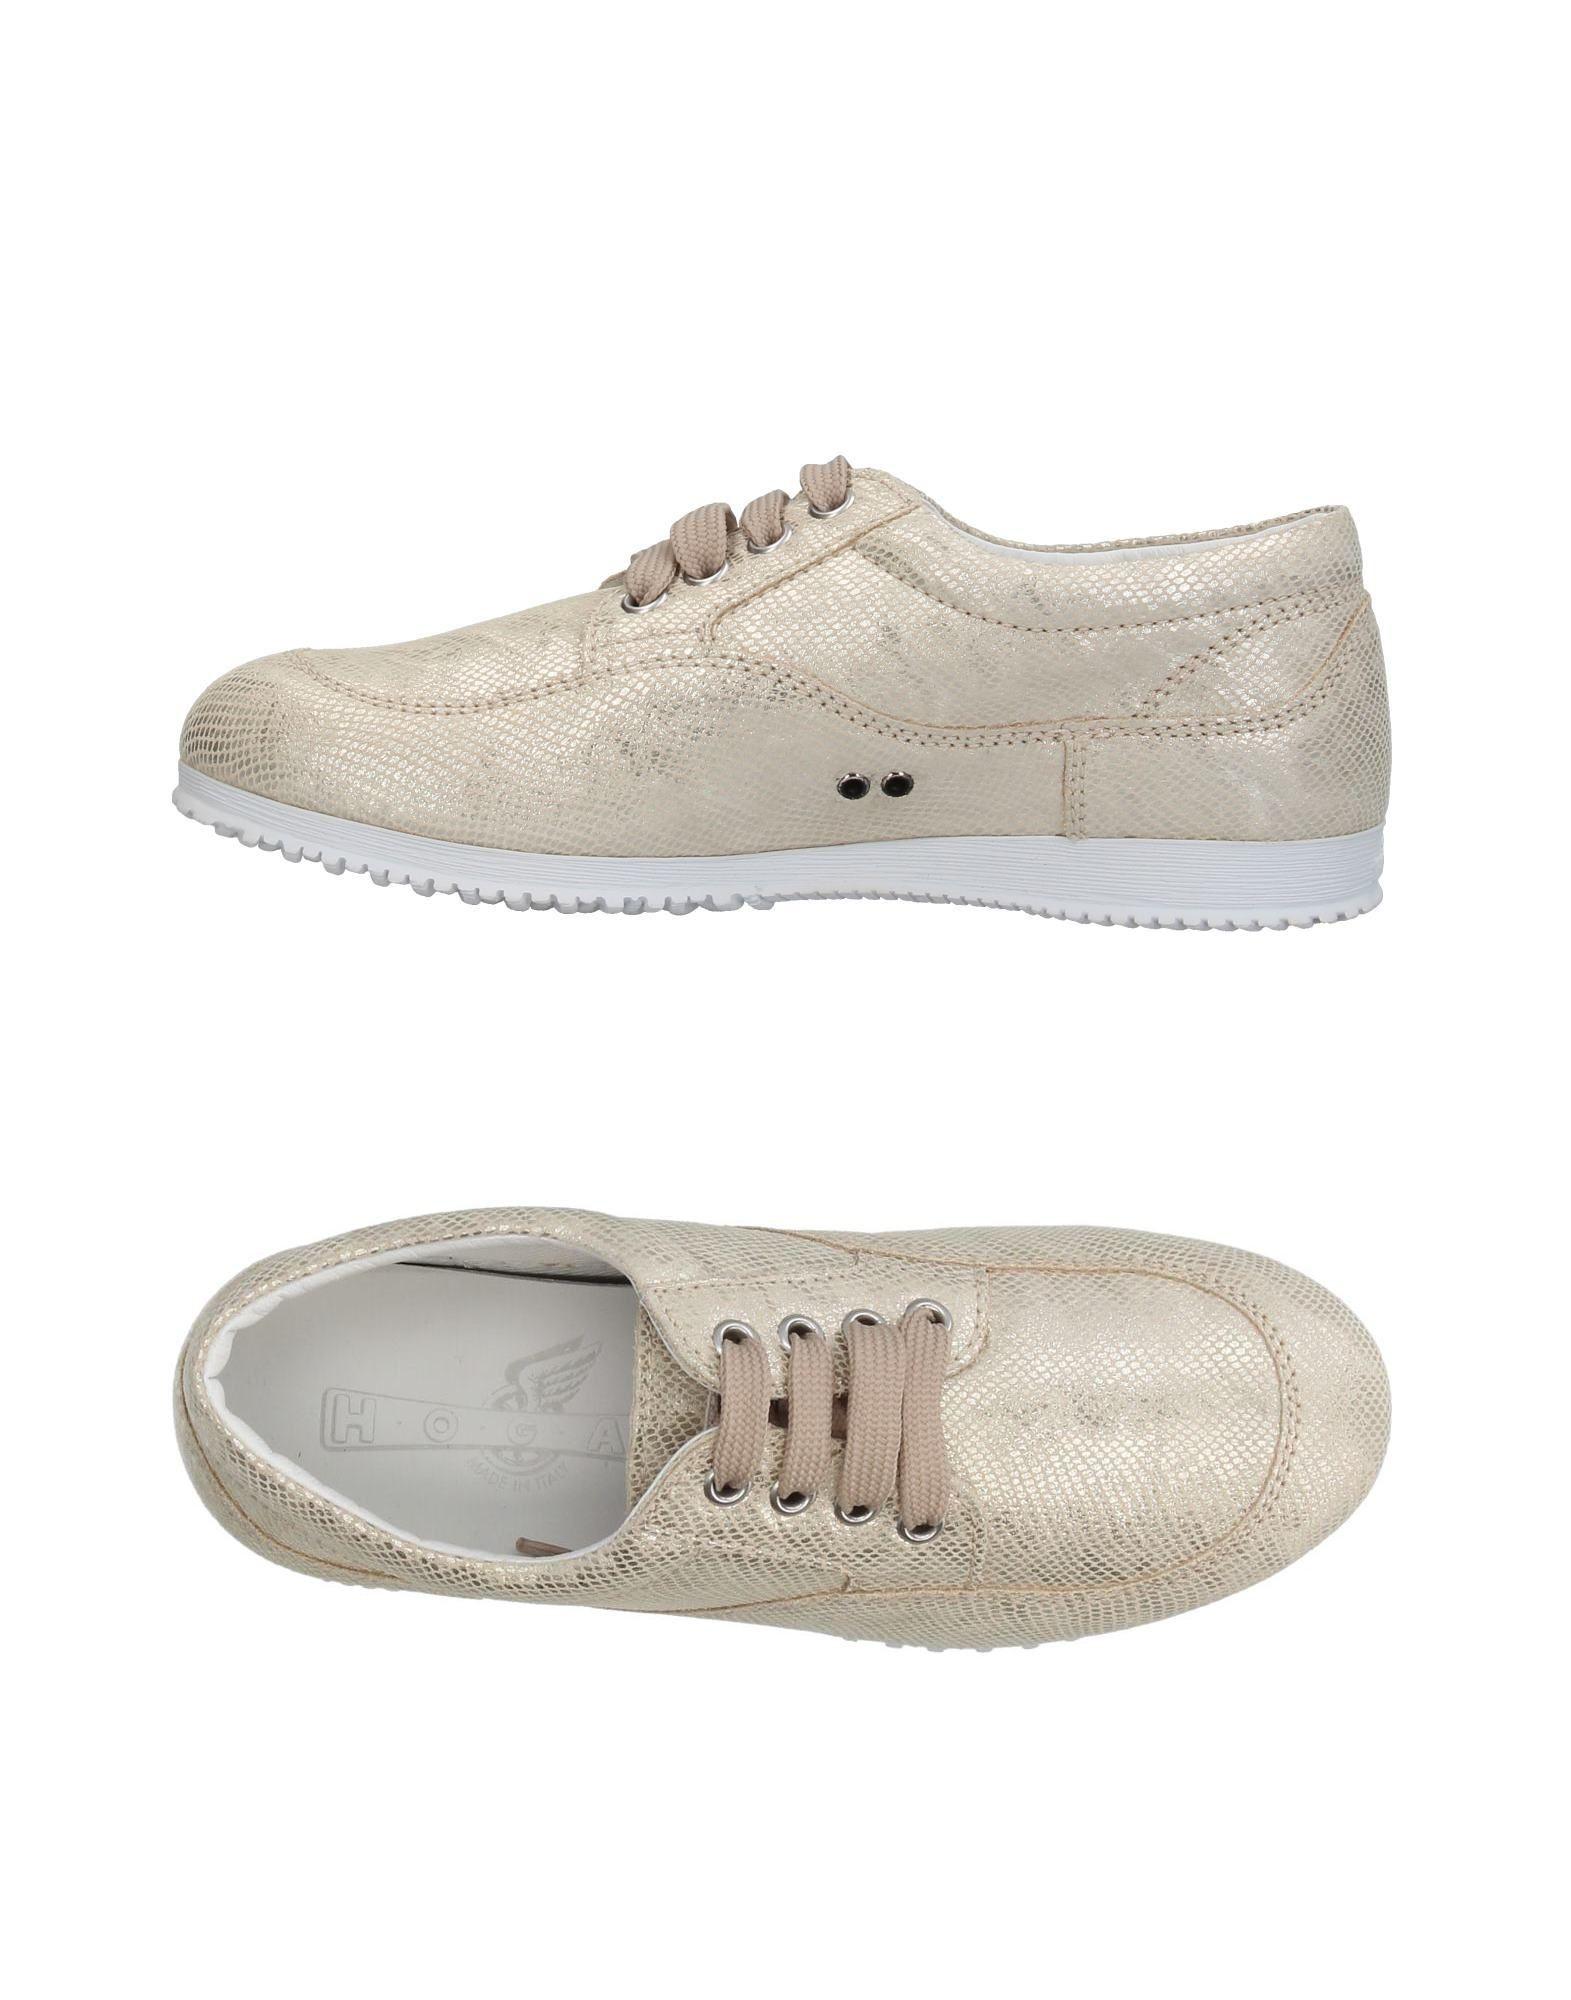 Gut um billige Damen Schuhe zu tragenHogan Sneakers Damen billige  11397120QG 2f422c